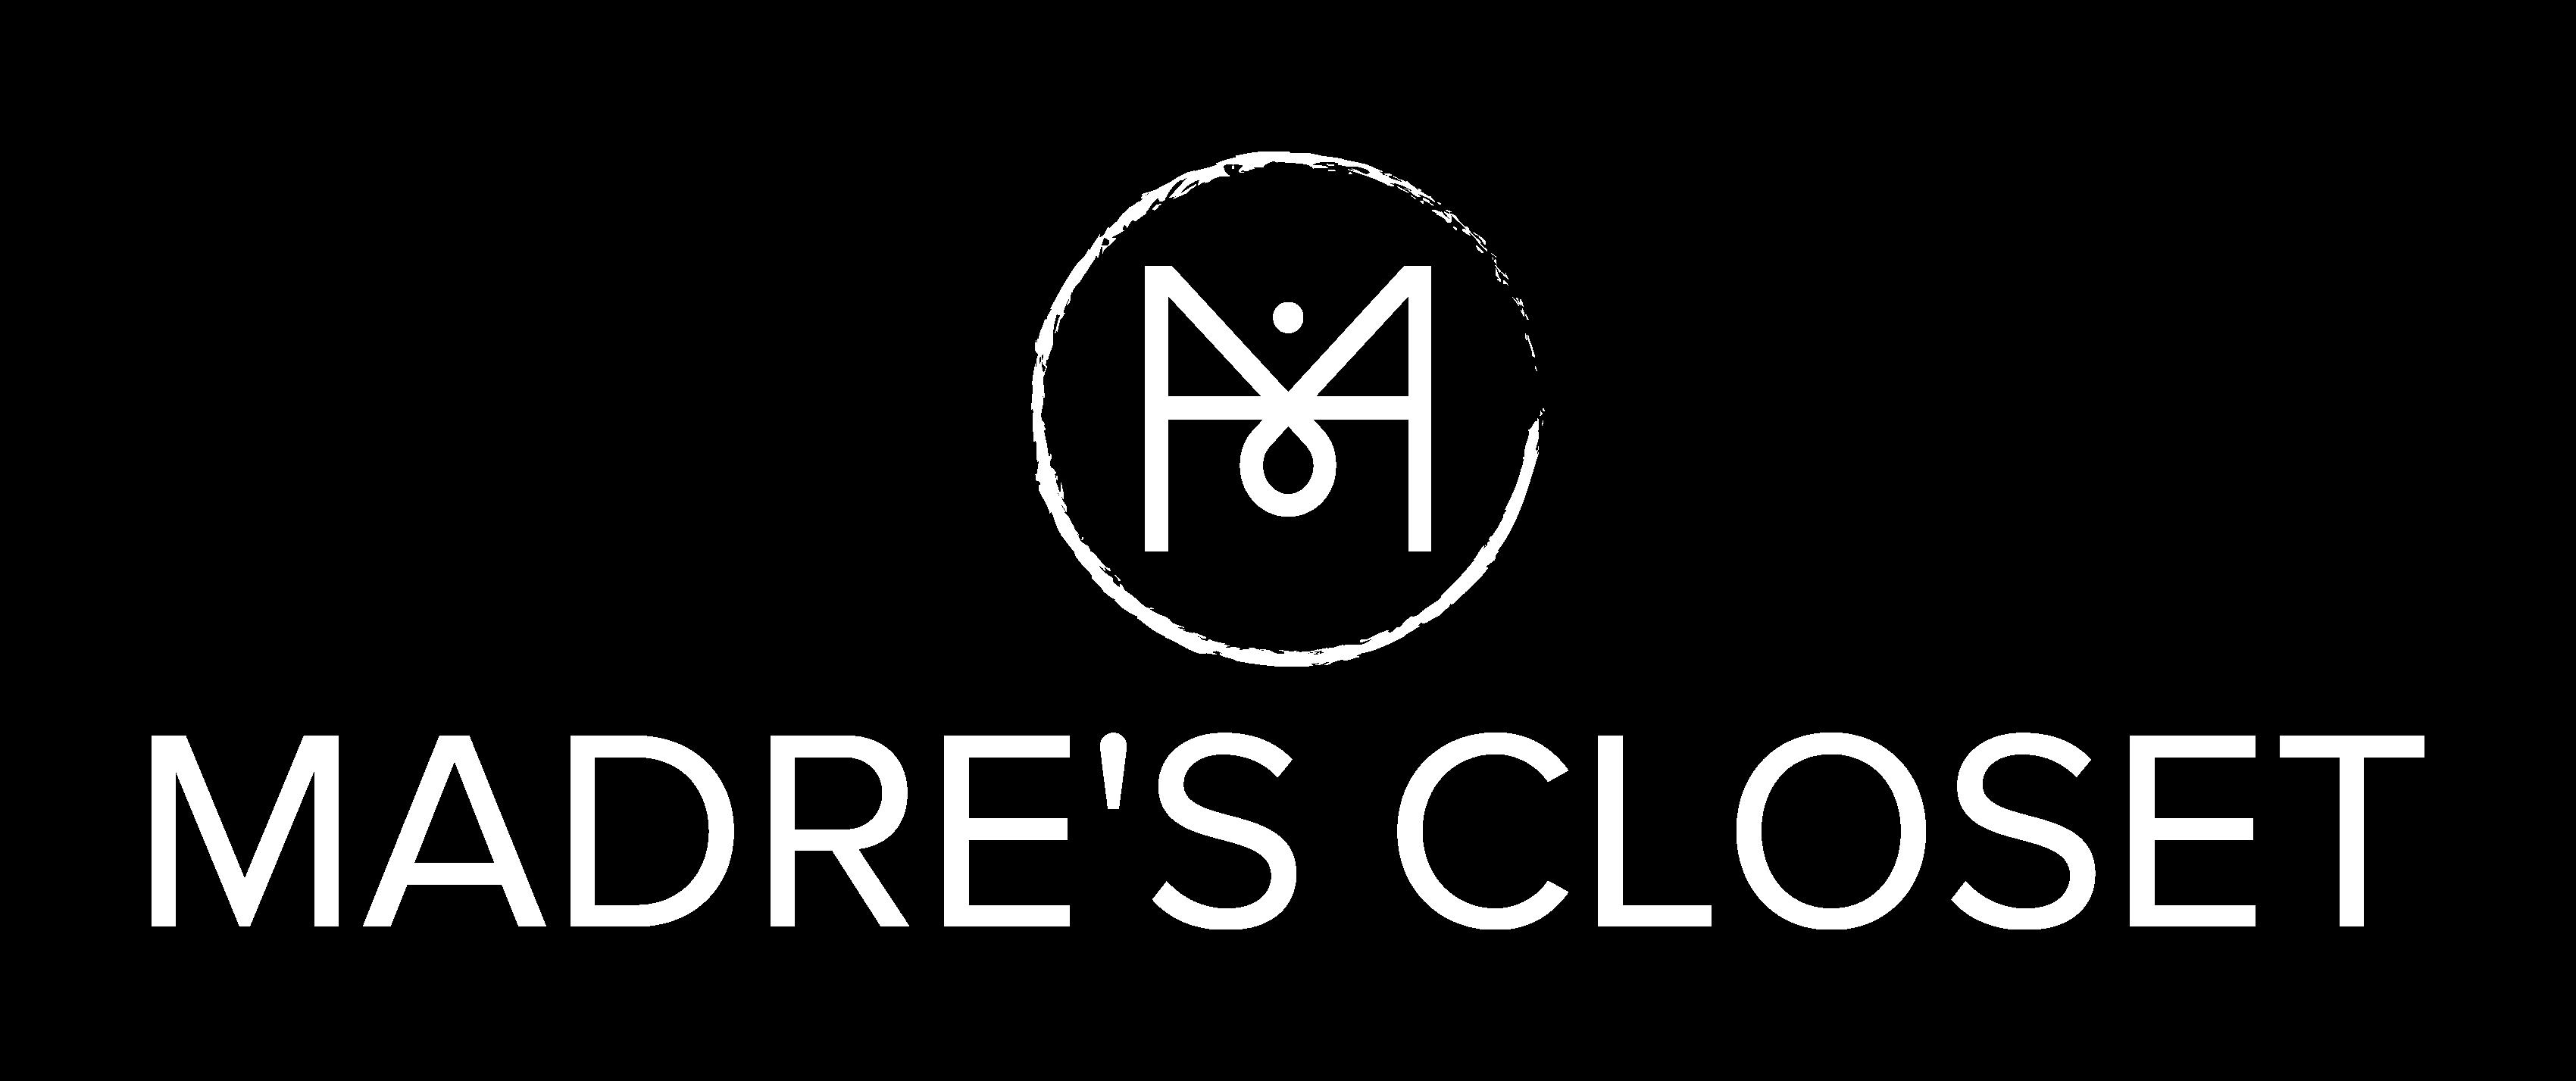 MADRE'S CLOSET